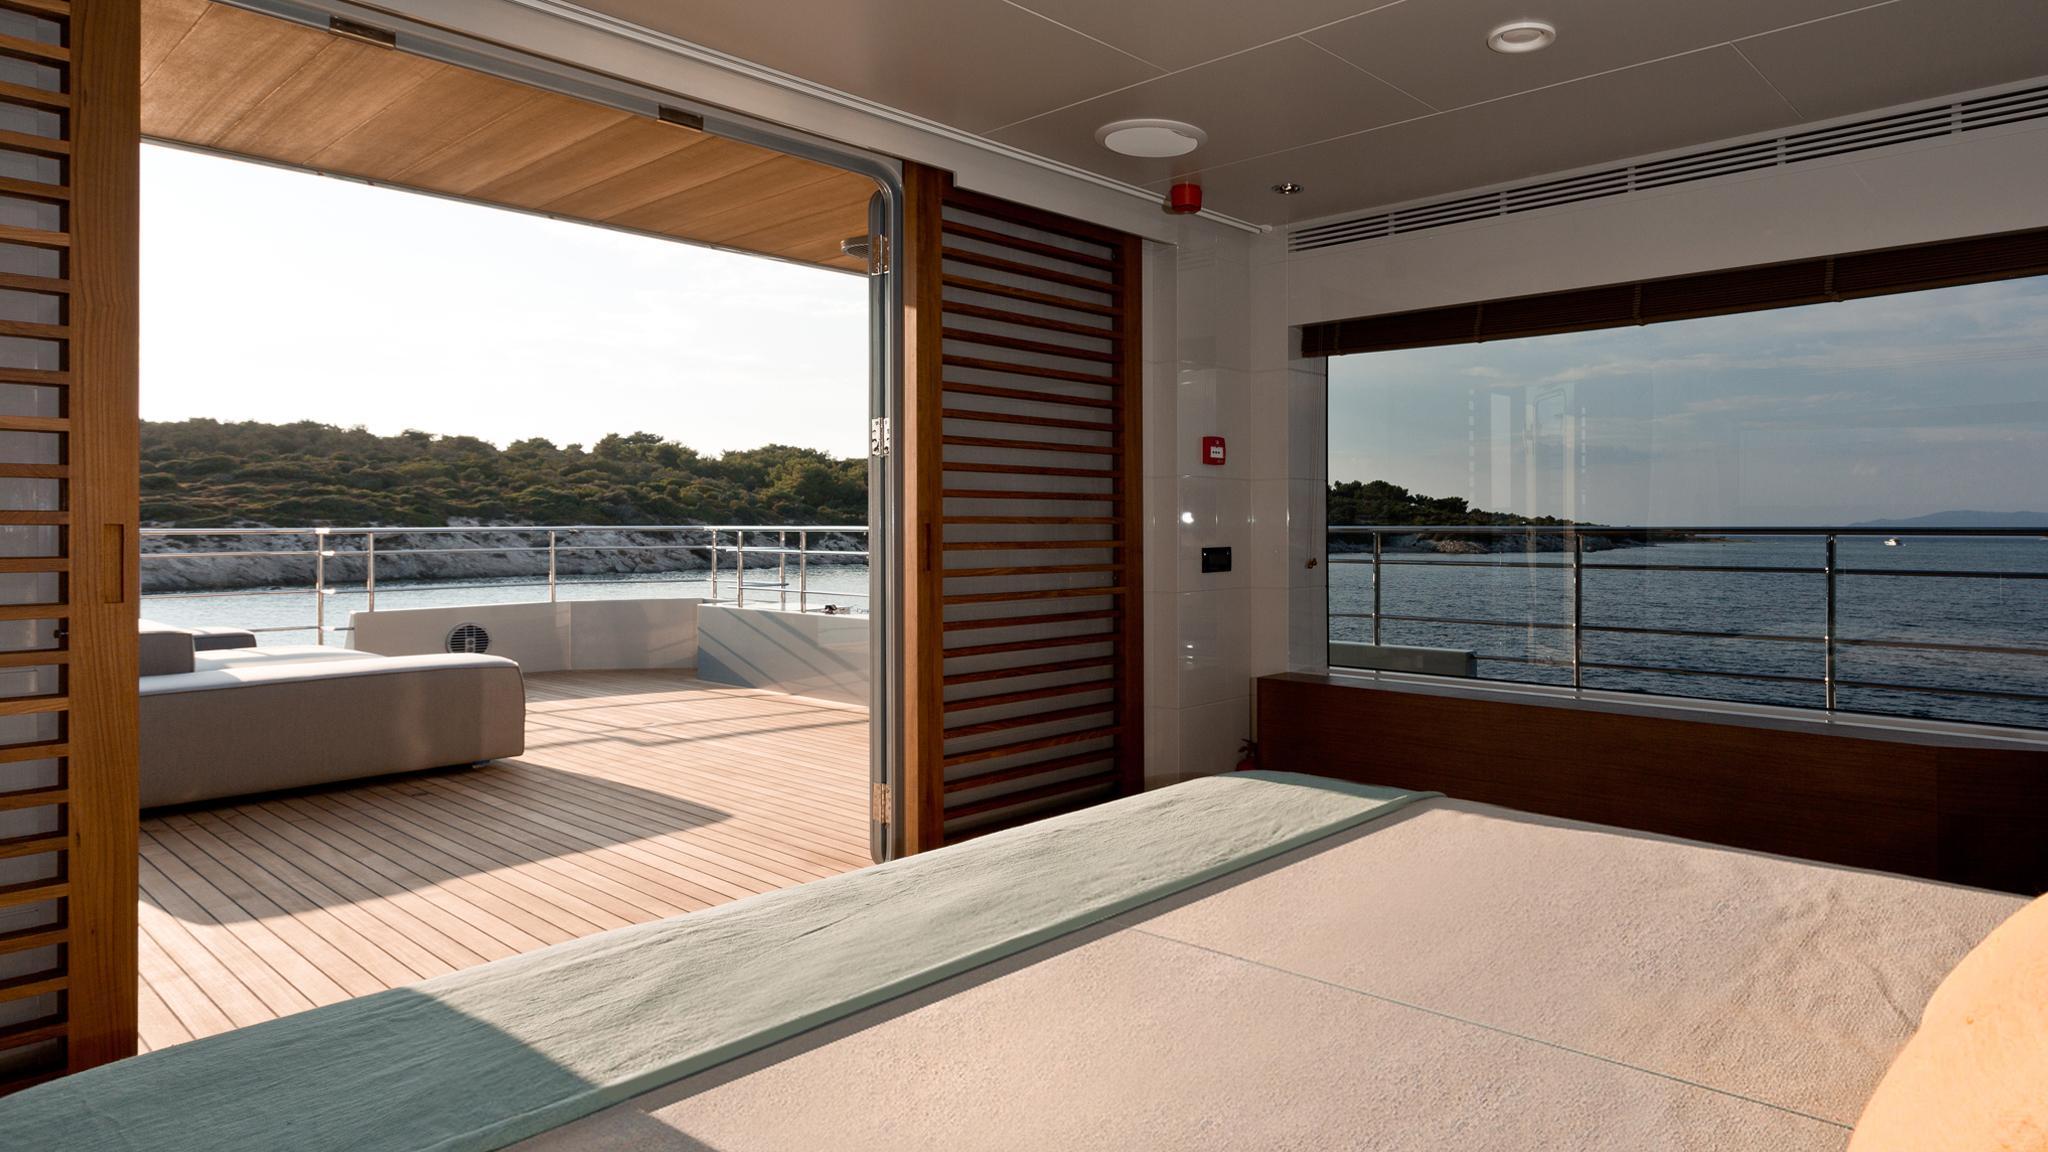 so-mar-motor-yacht-tansu-2014-38m-private-deck